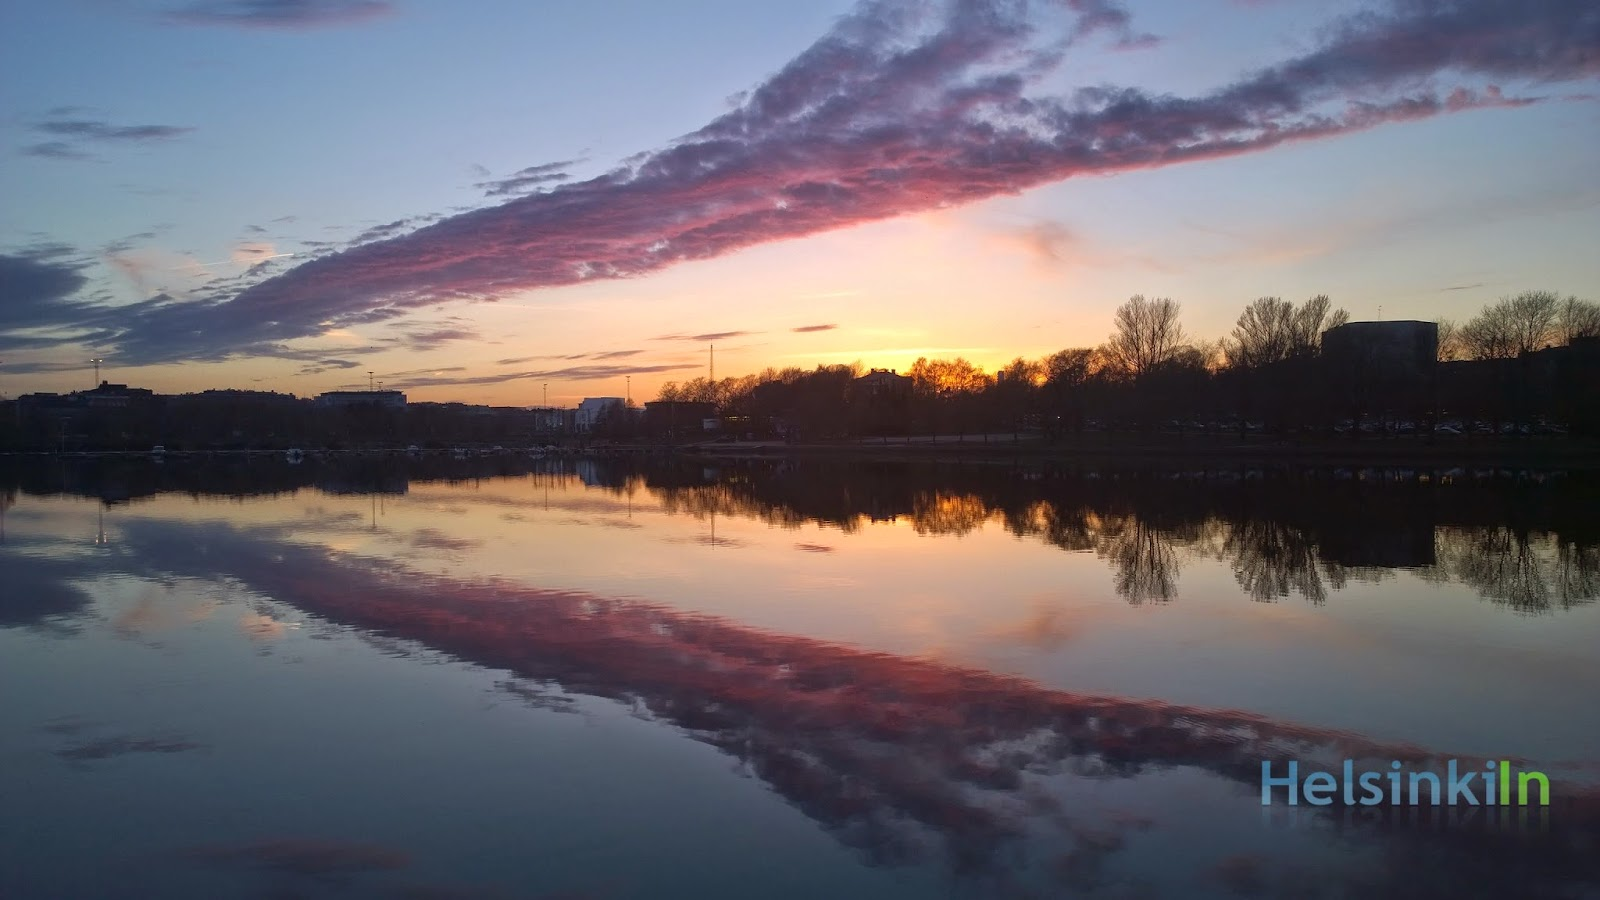 sunset over Töölö